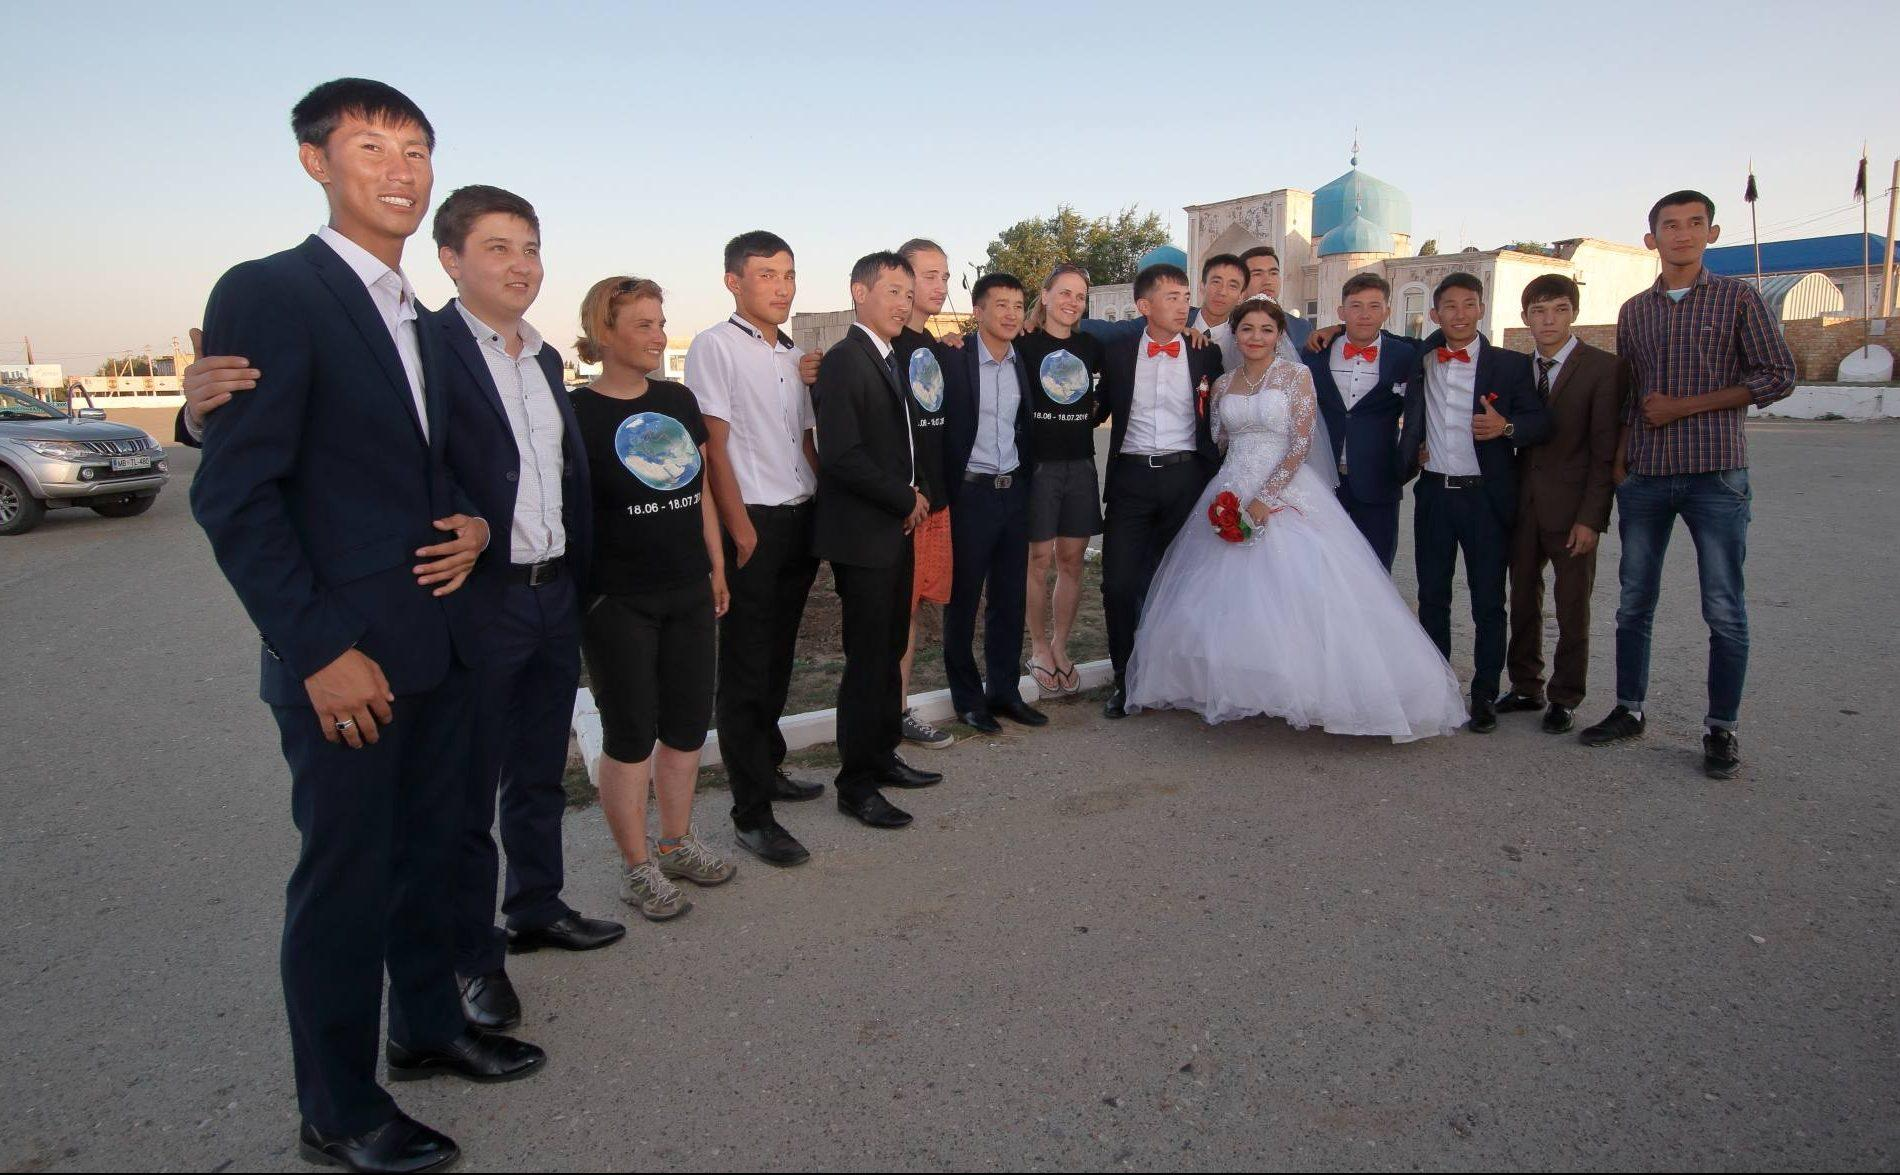 Pot po srednjem Kazahstanu, od Arkalyka proti Aralsku